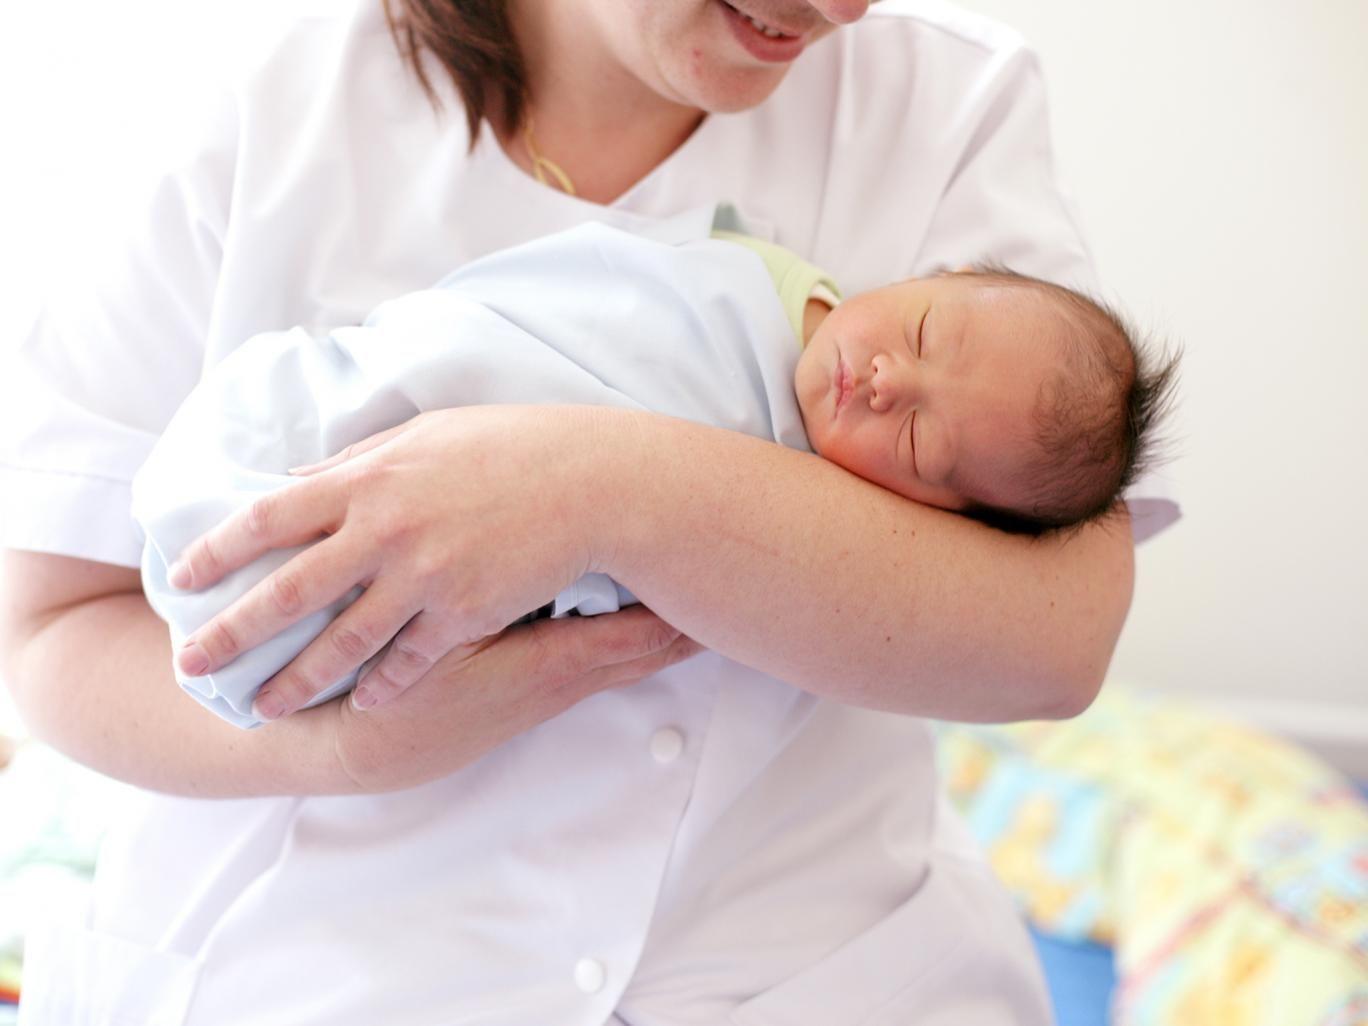 Pin on neonatal nurse practitioners